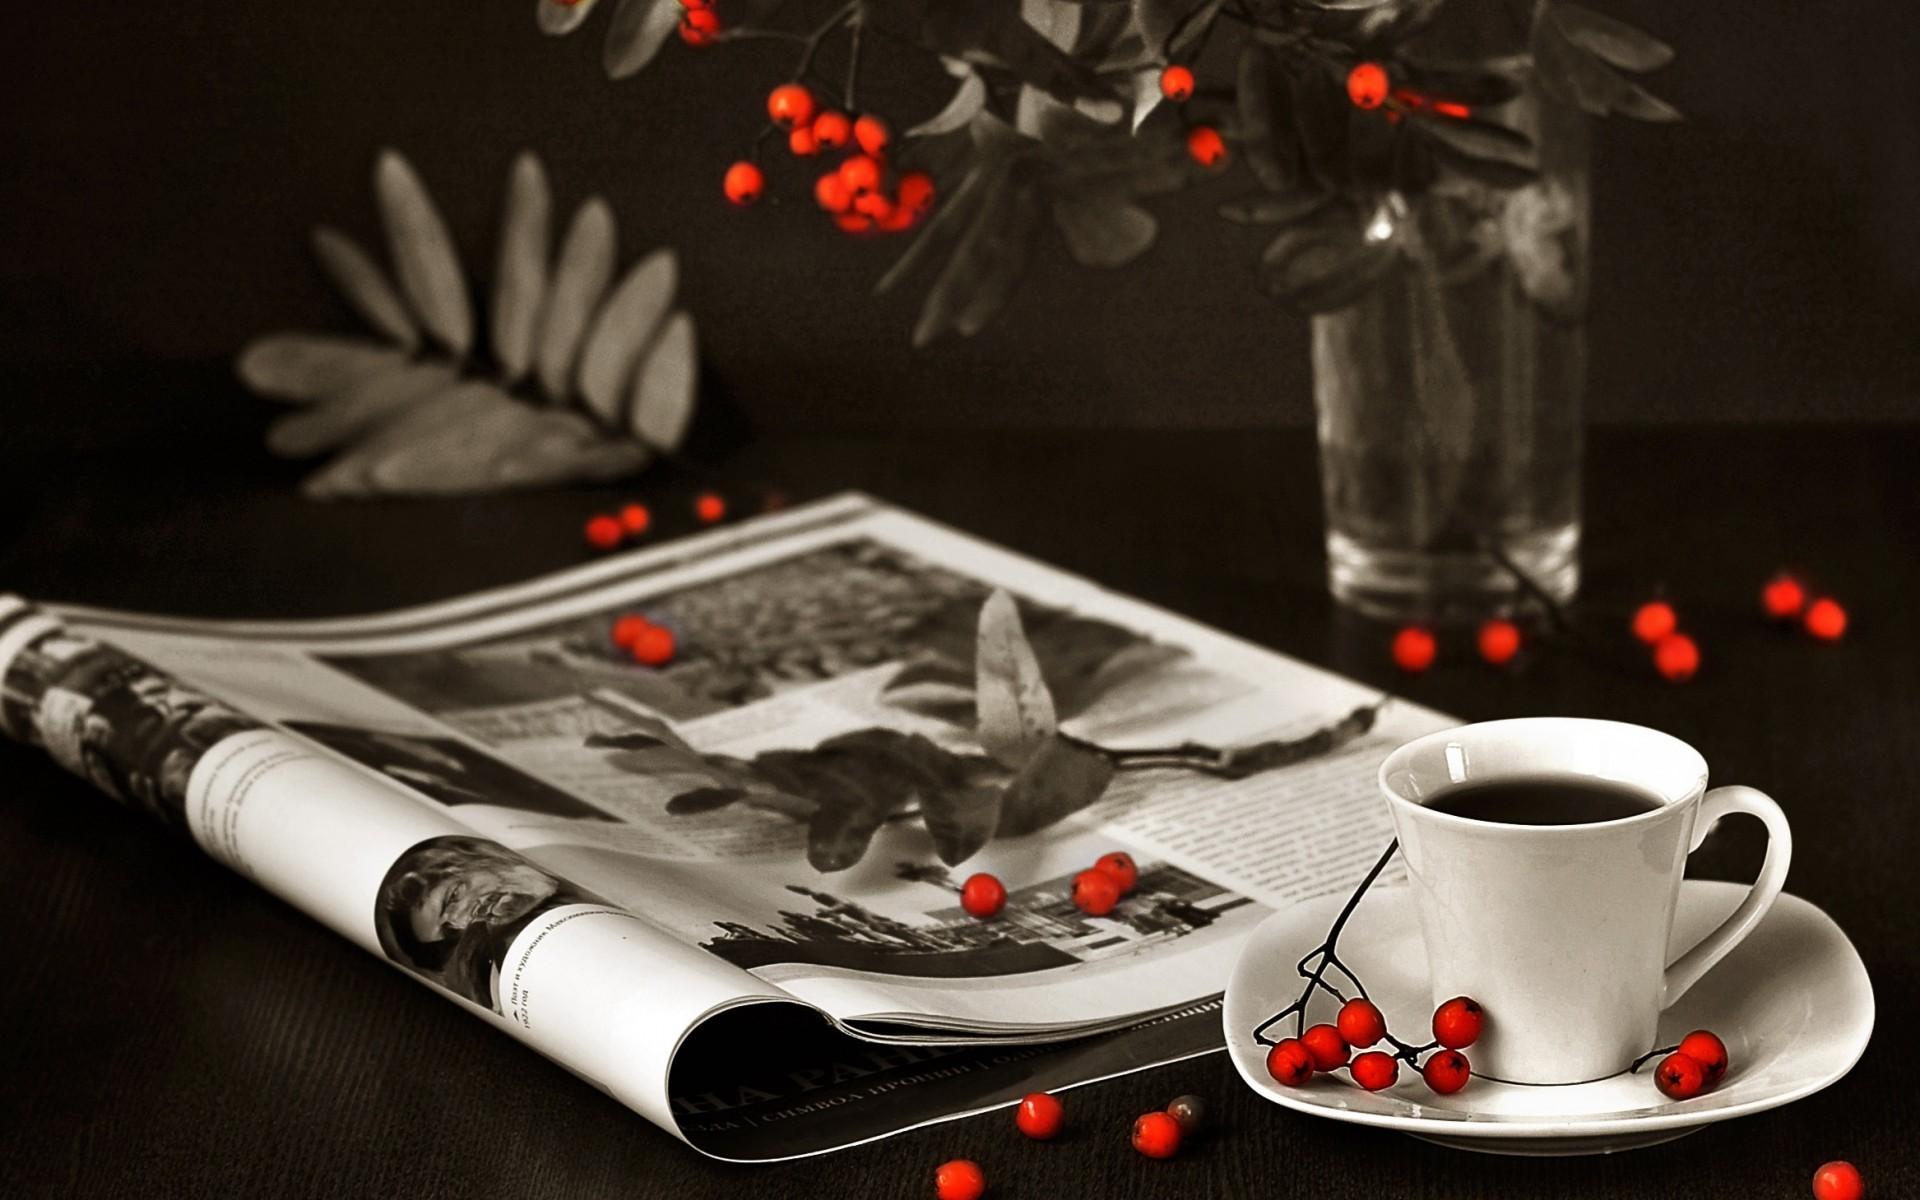 Wallpaper Hitam Merah Mewarnai Selektif Minum Cangkir